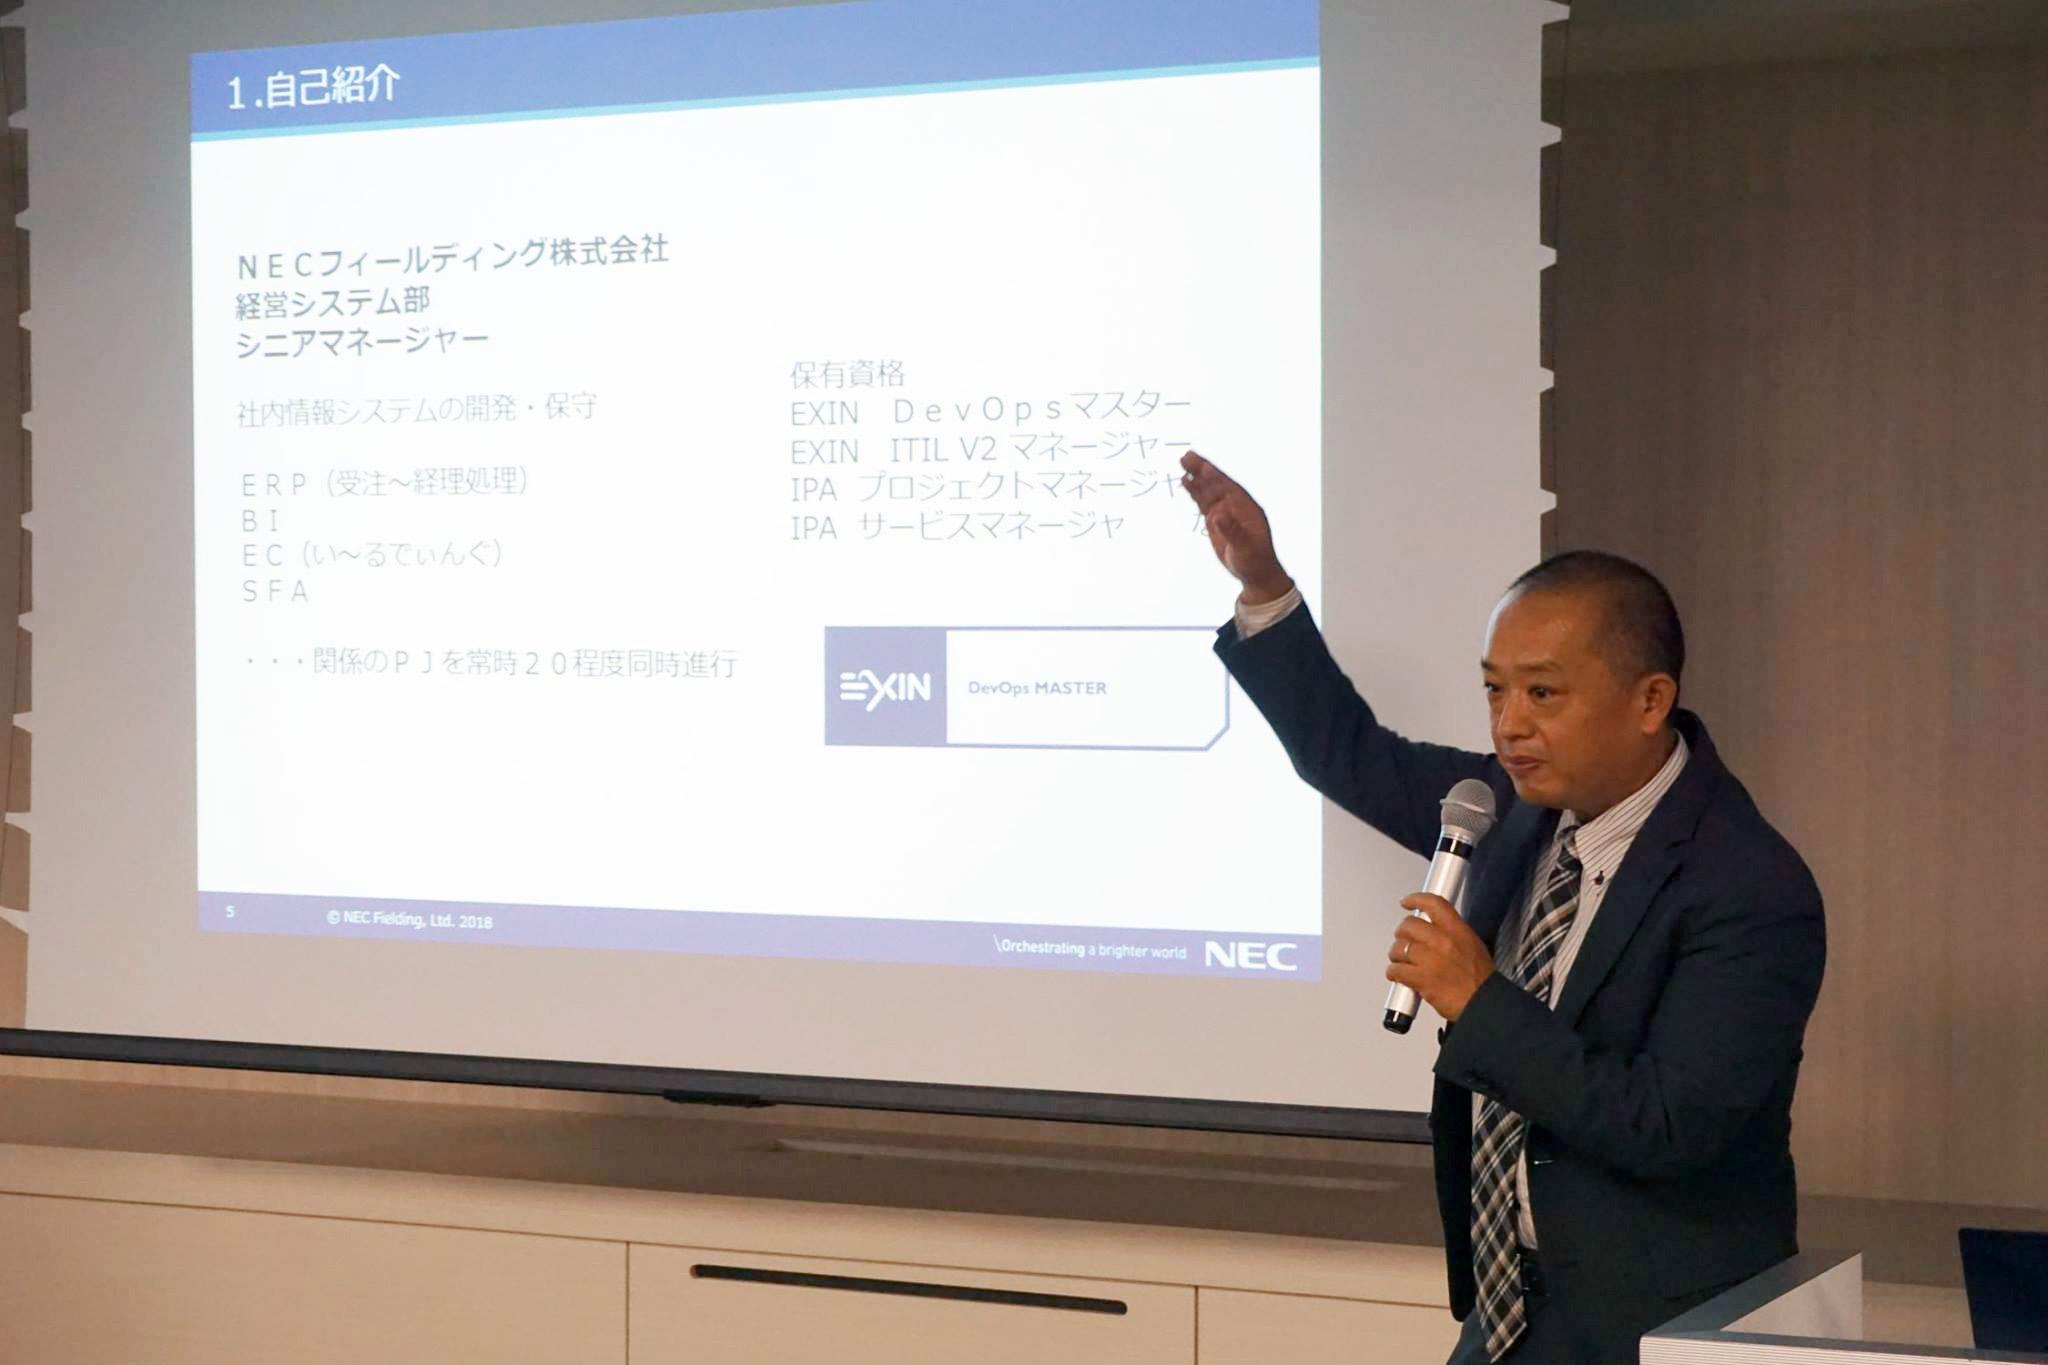 NECフィールディング株式会社 福井 桂太様